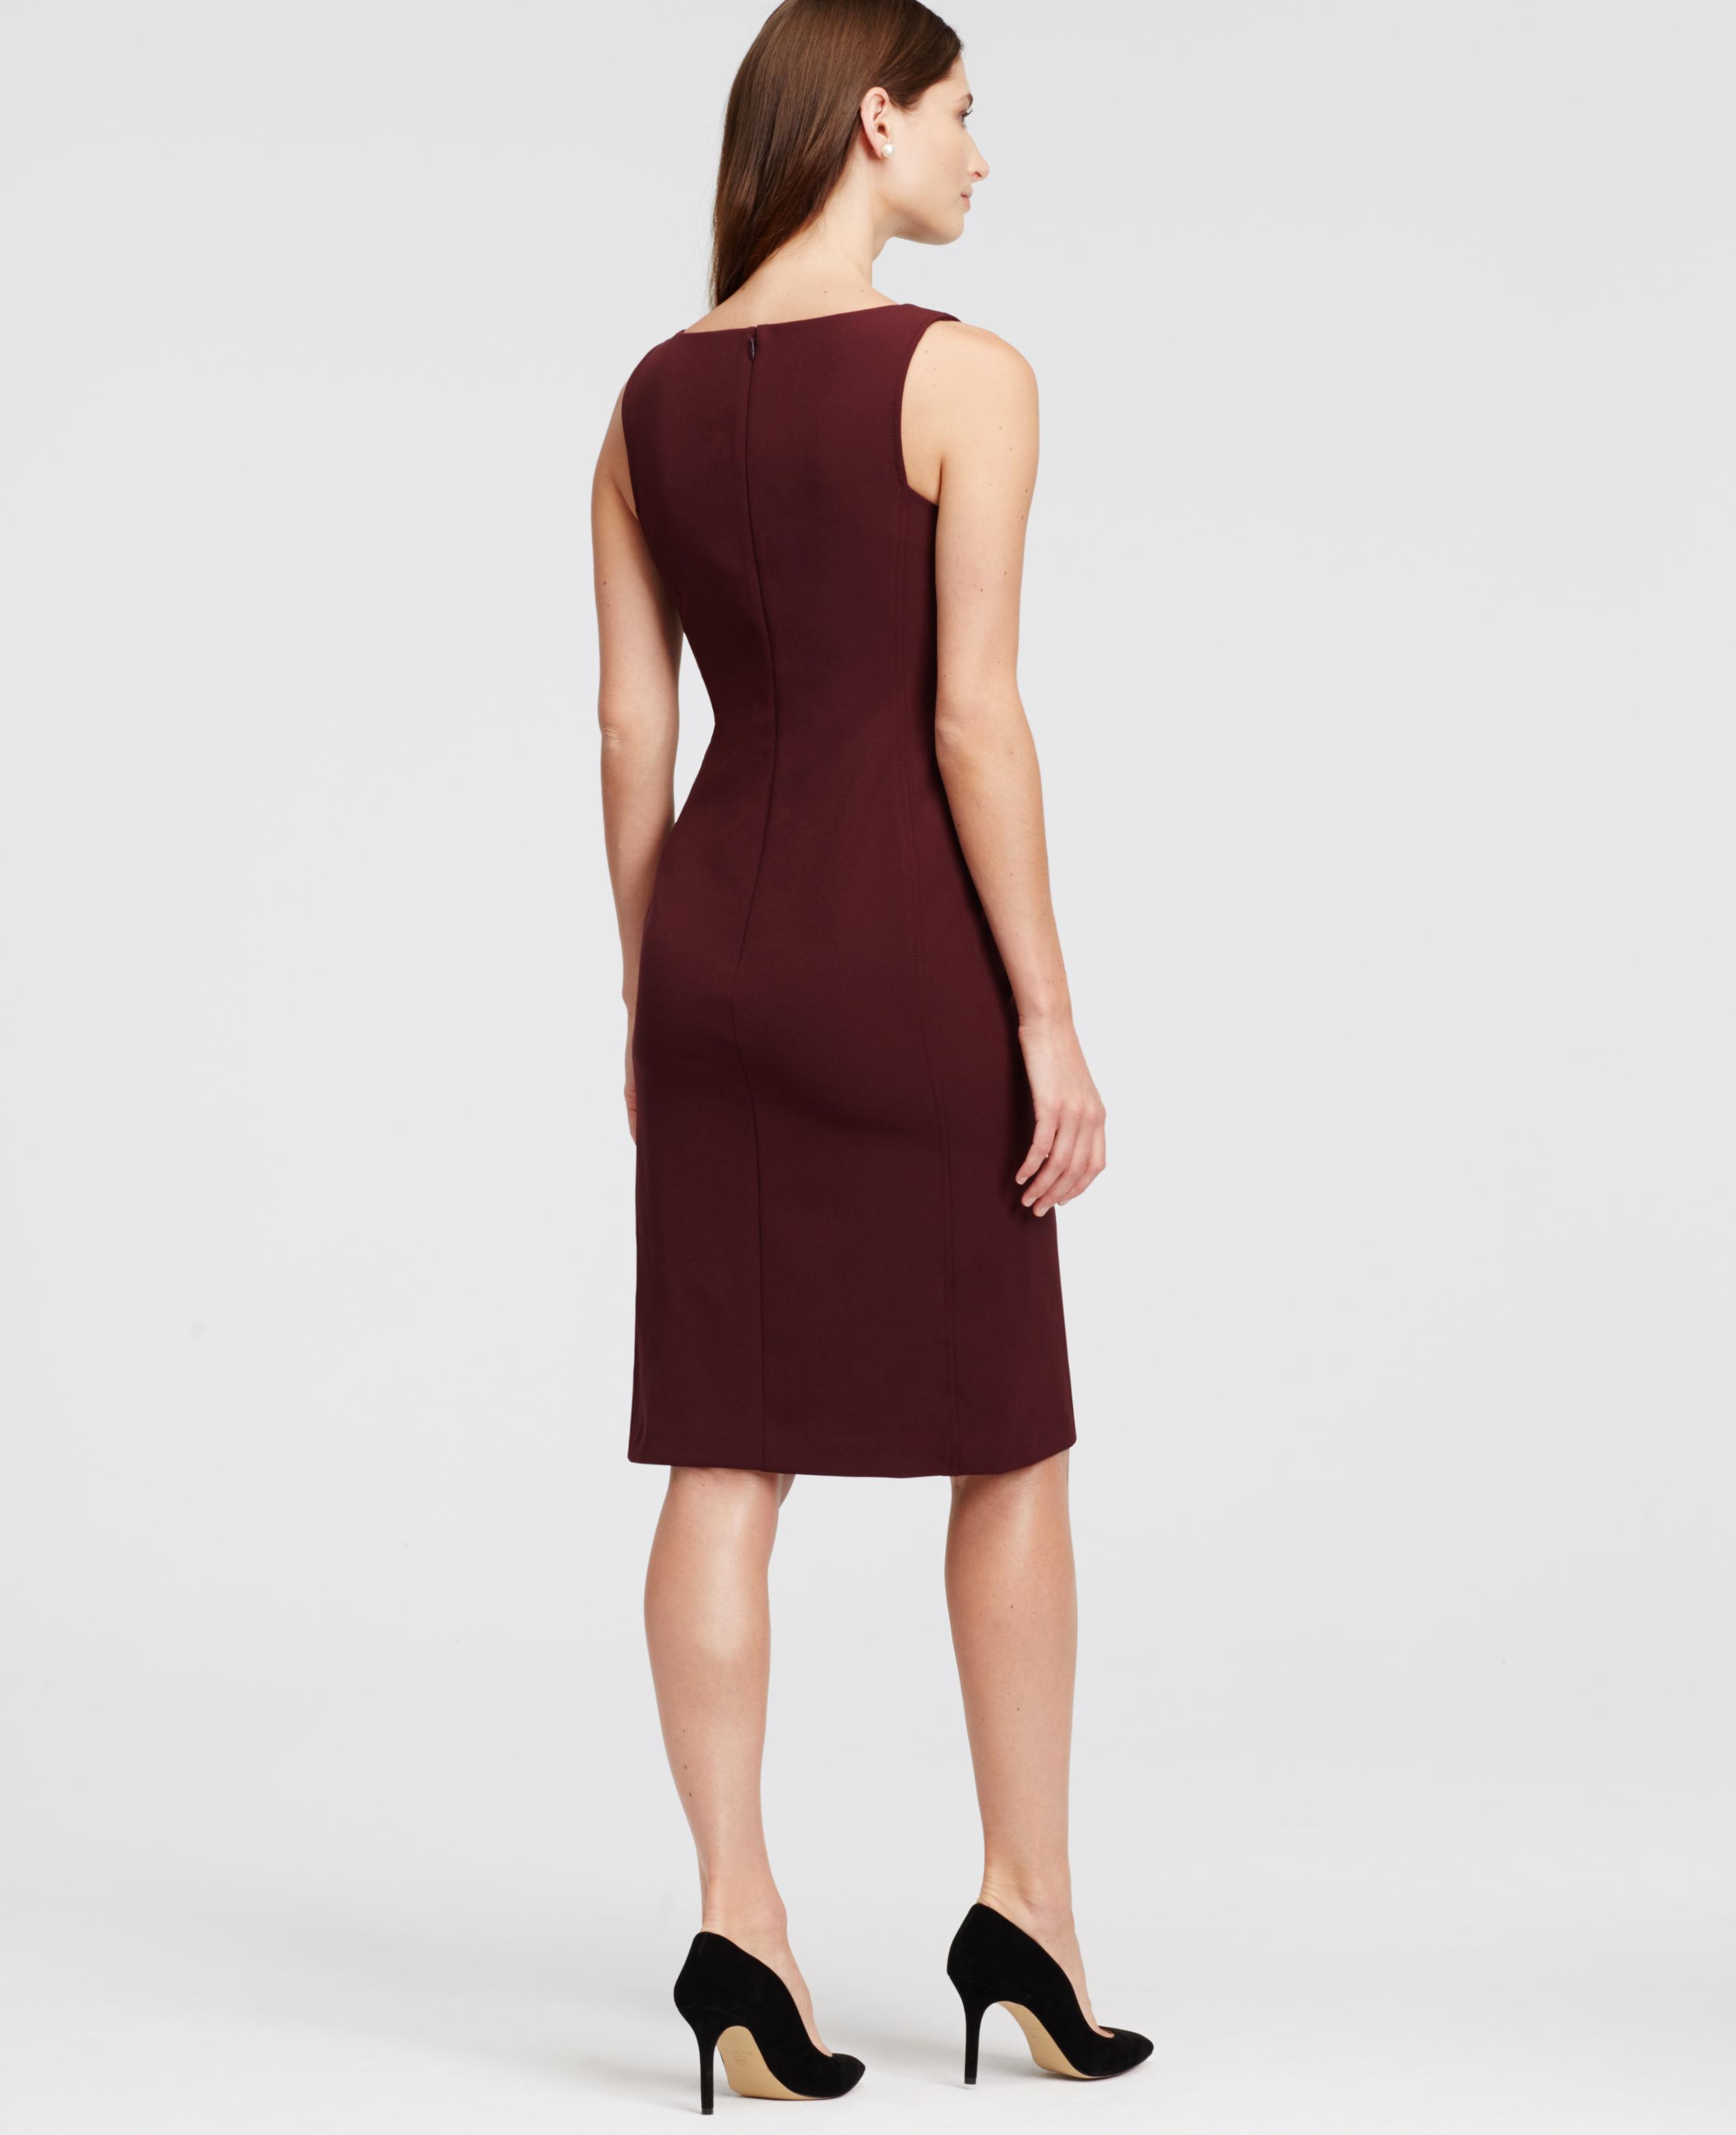 Ann taylor Sleeveless Sheath Dress in Purple (Classic Plum